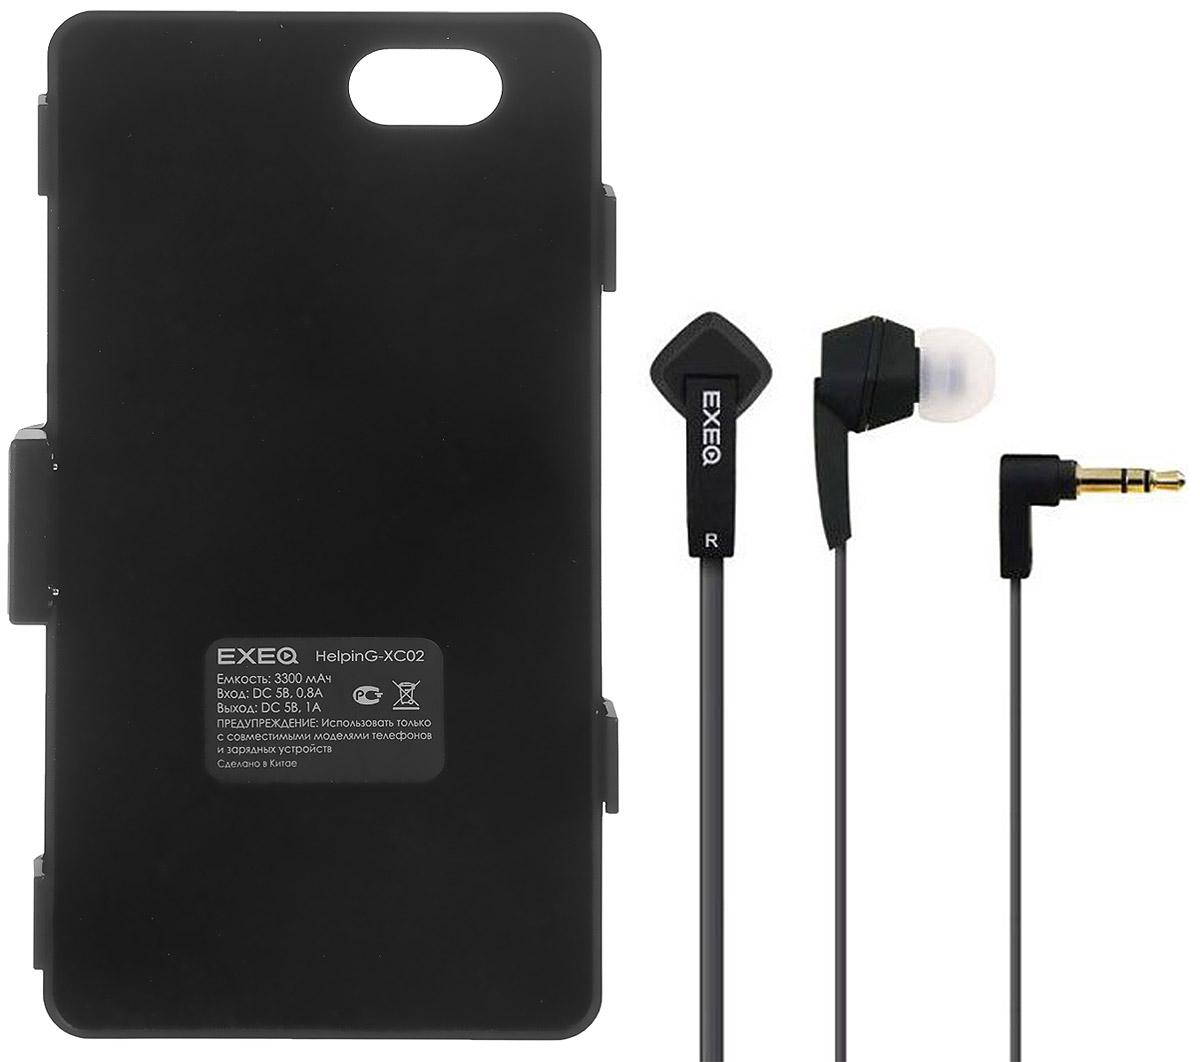 EXEQ HelpinG-XC02 чехол-аккумулятор для Sony Xperia Z1 Compact, Black (3300 мАч, клип-кейс) аккумулятор для sony xperia tx 3400mah с